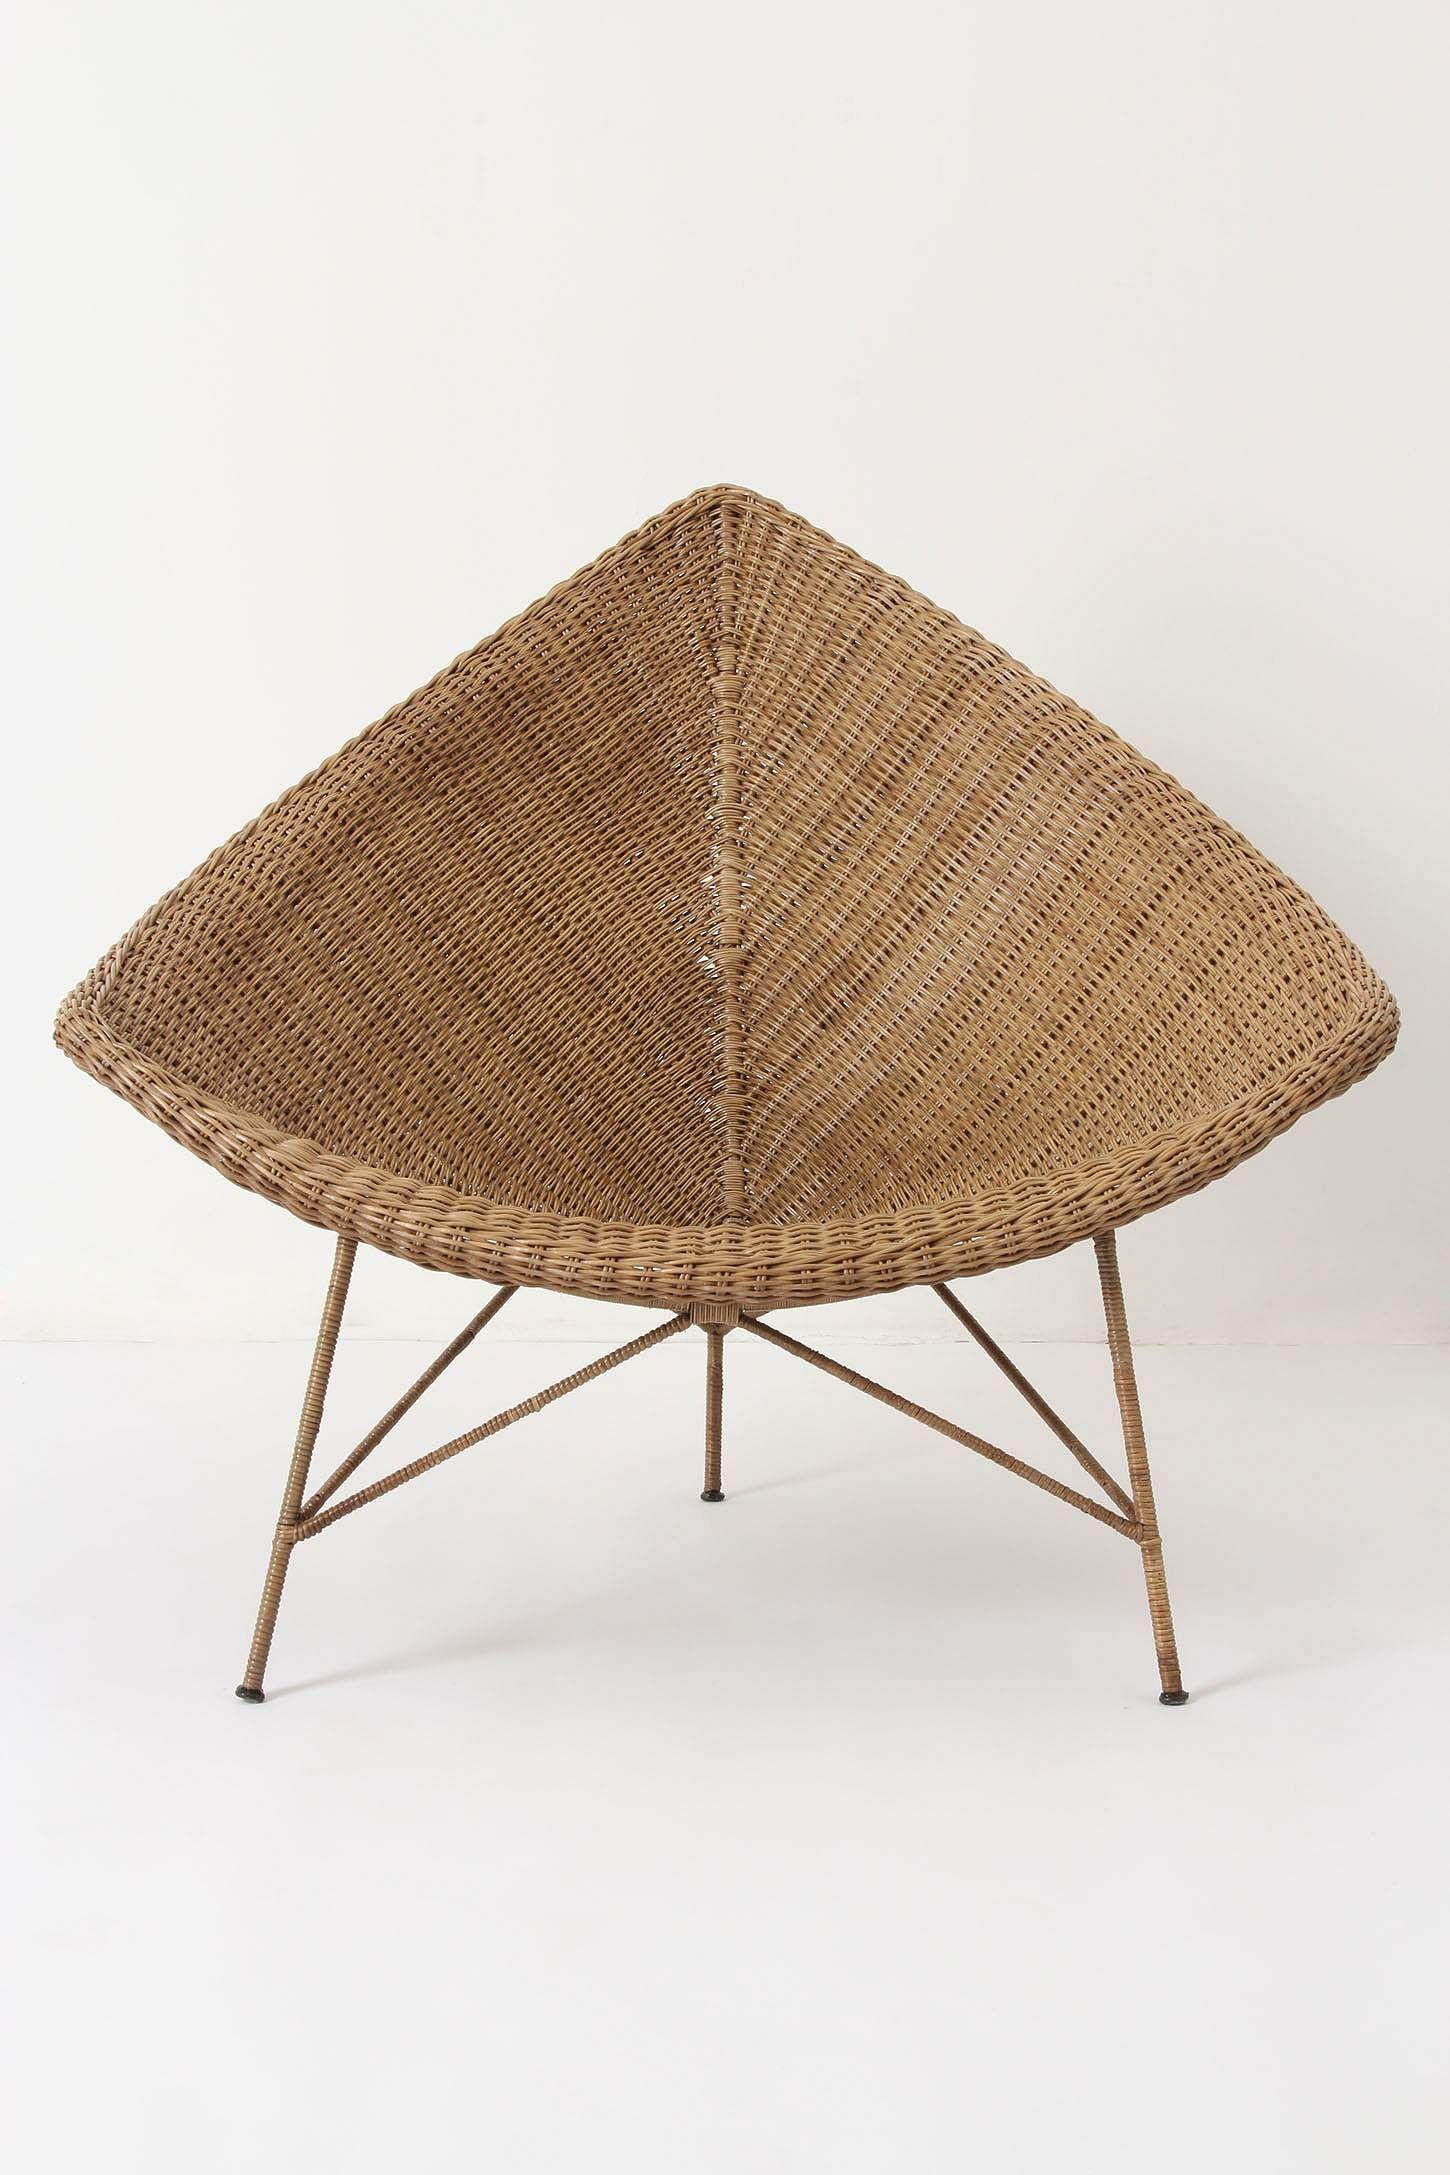 Anthropologie Naida Chair | MUEBLES FIBRAS NATURALES | Pinterest ...